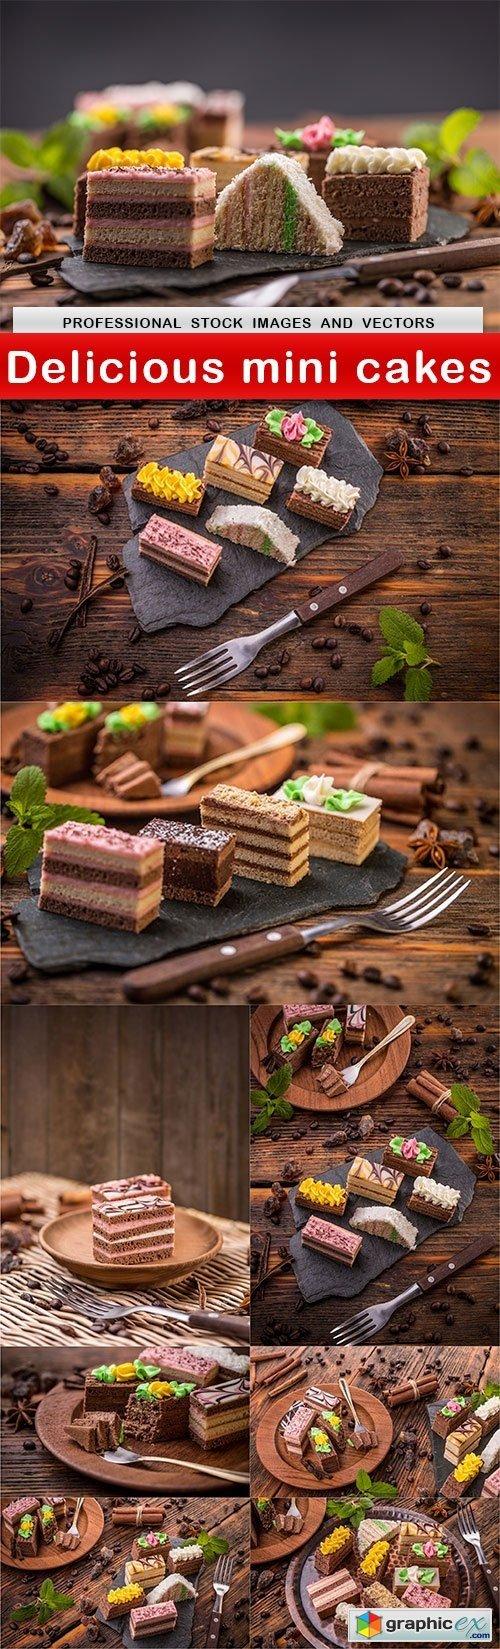 Delicious mini cakes  9 UHQ JPEG  stock images